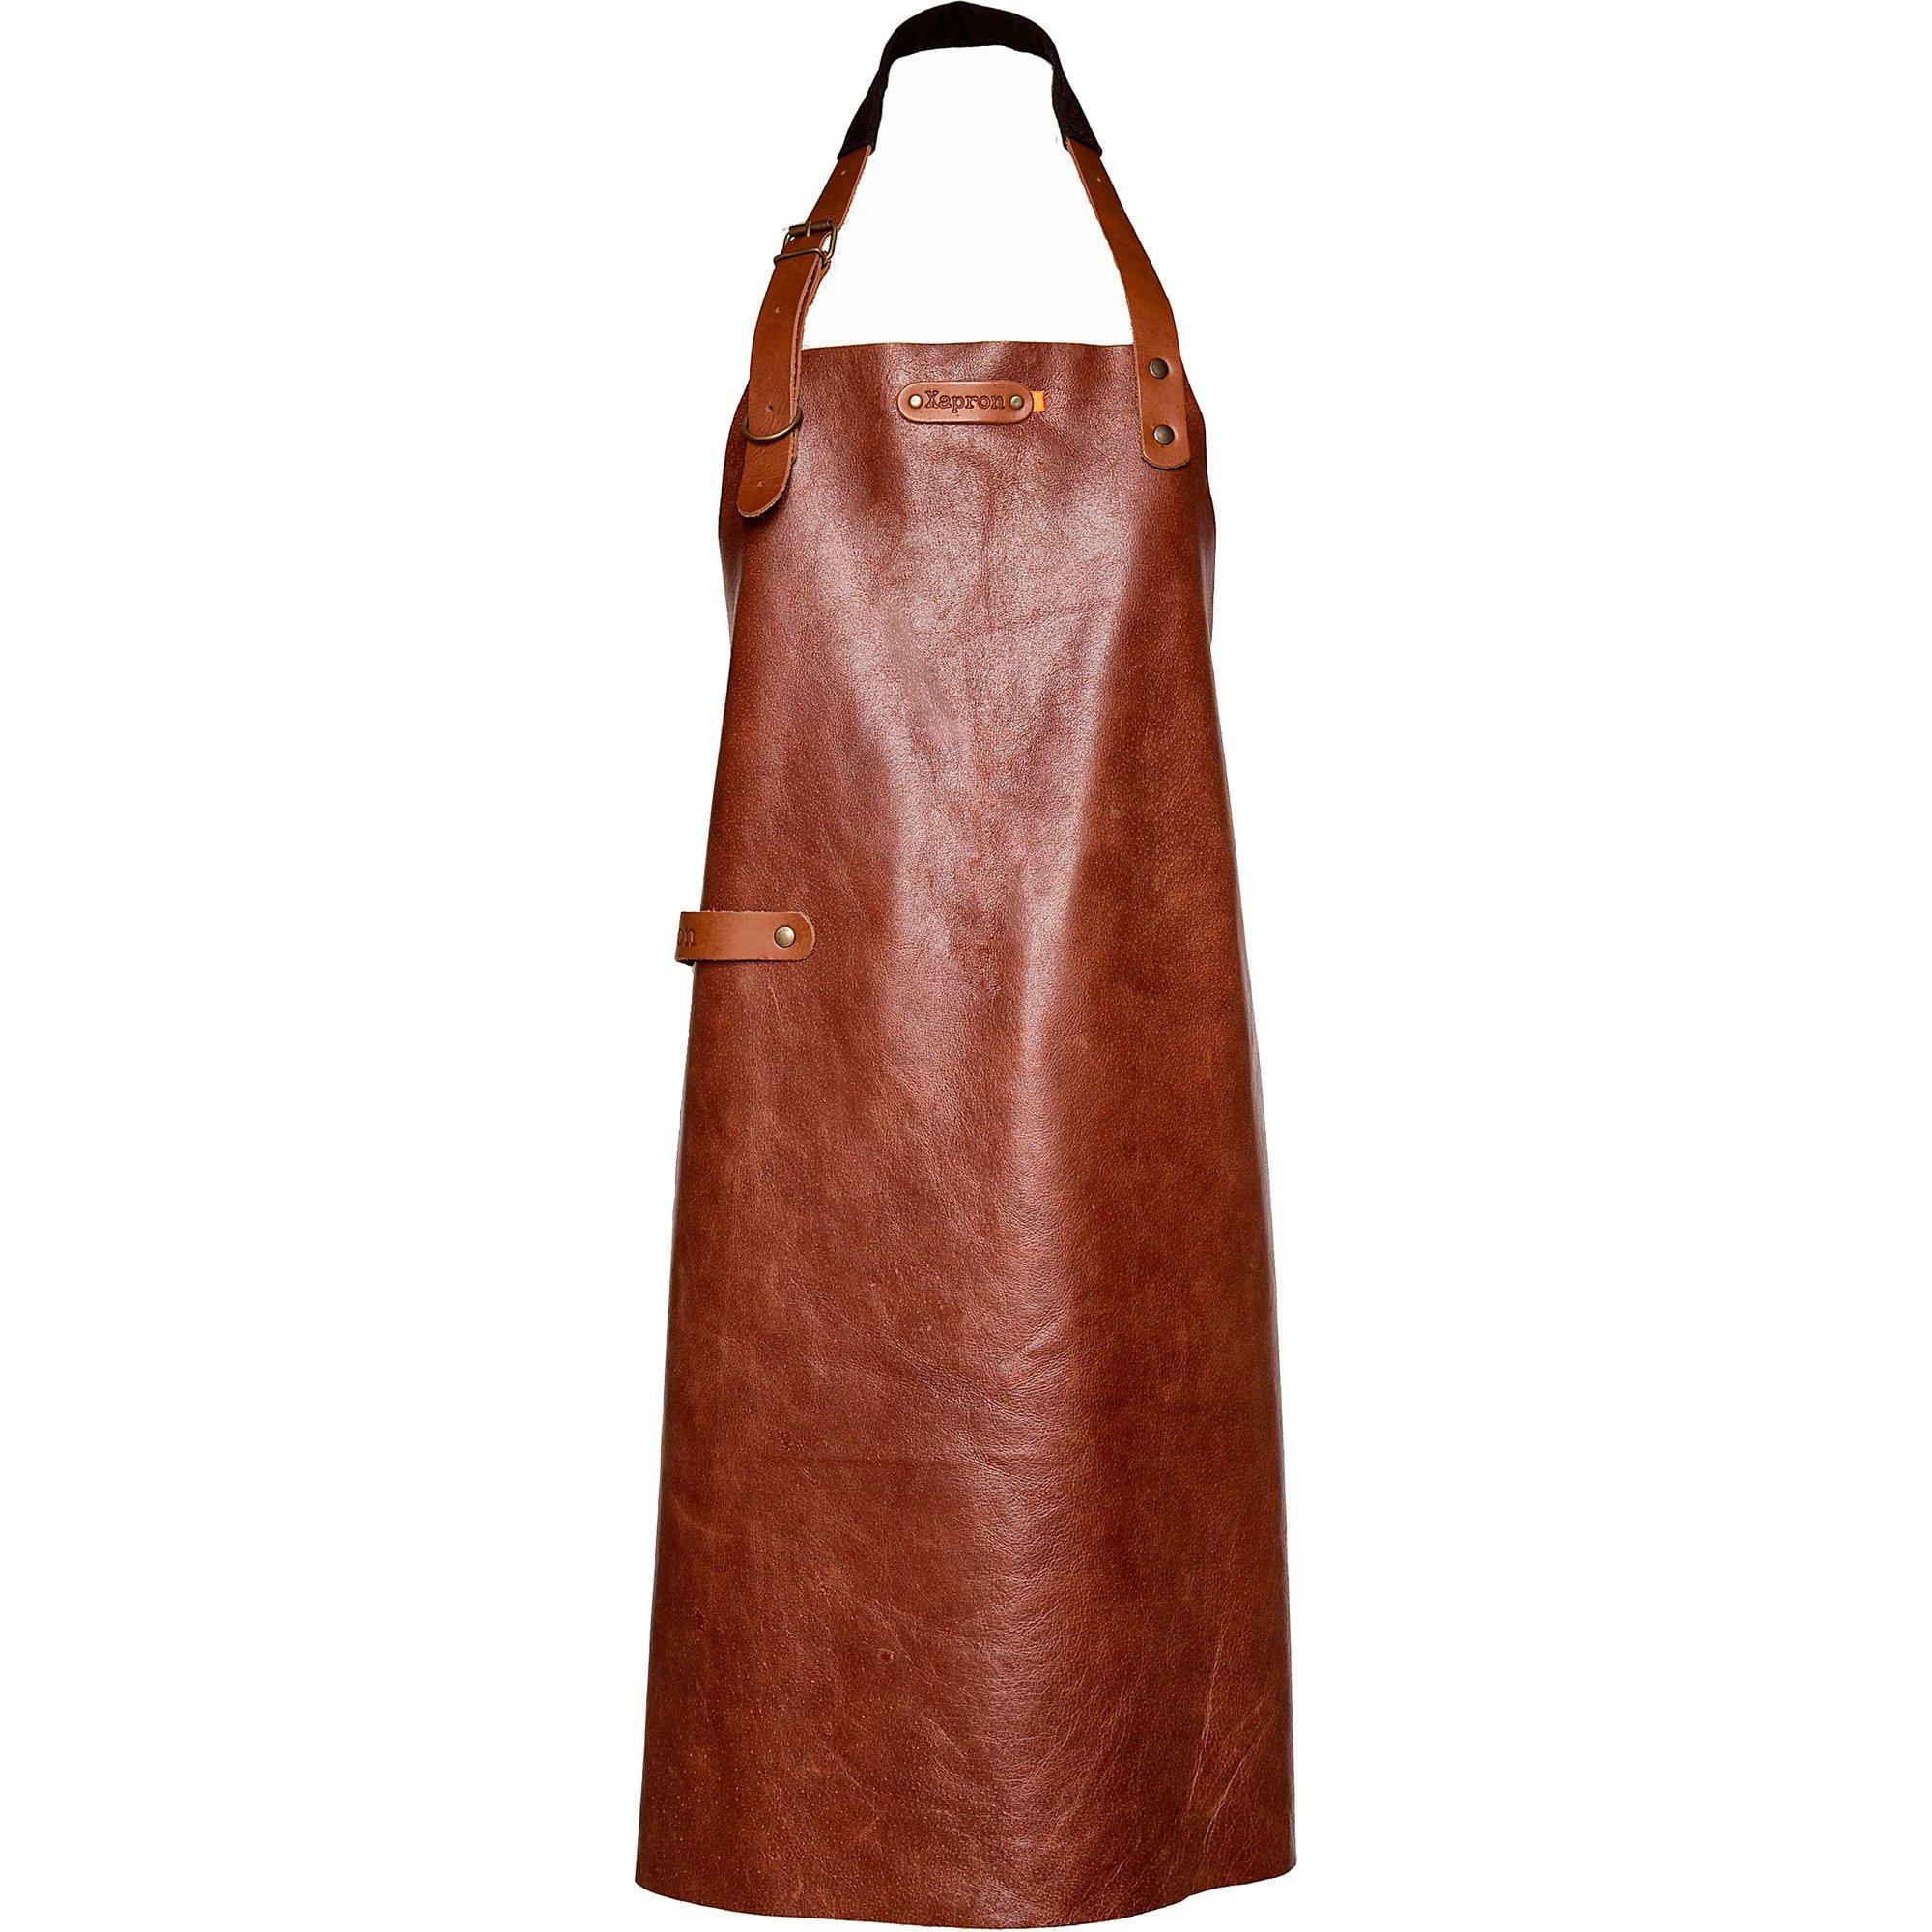 Xapron New York förkläde i cognac-brun XL